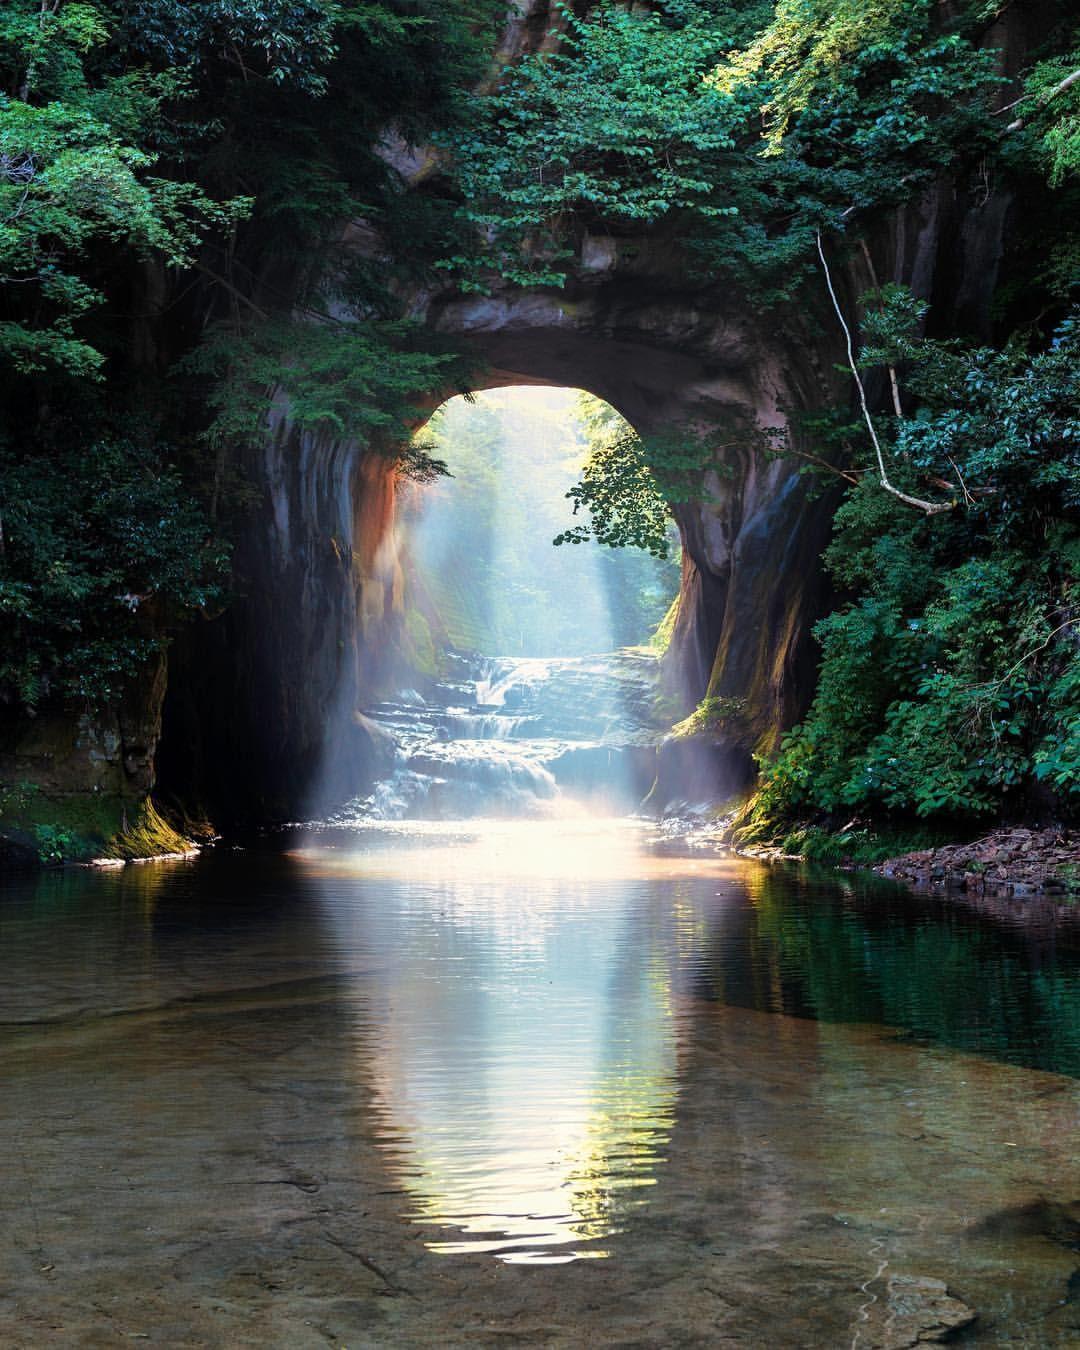 Do you like this little cave? . . ハートの光ももちろん好きですが実はこの光の差し方 ...